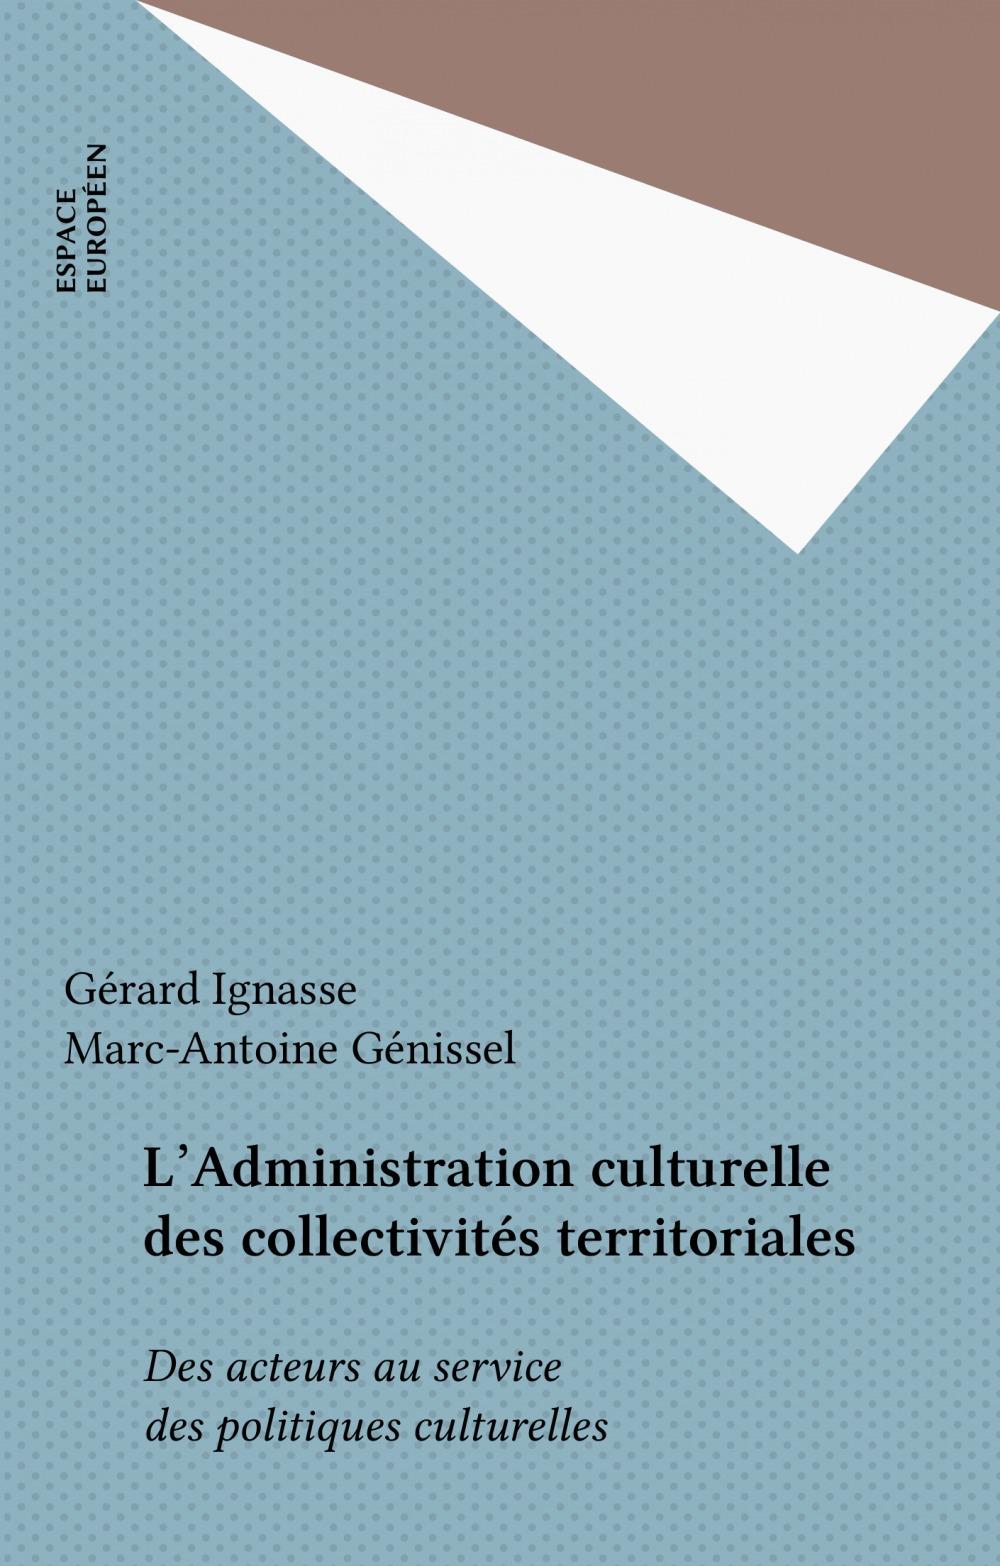 L'Administration culturelle des collectivités territoriales